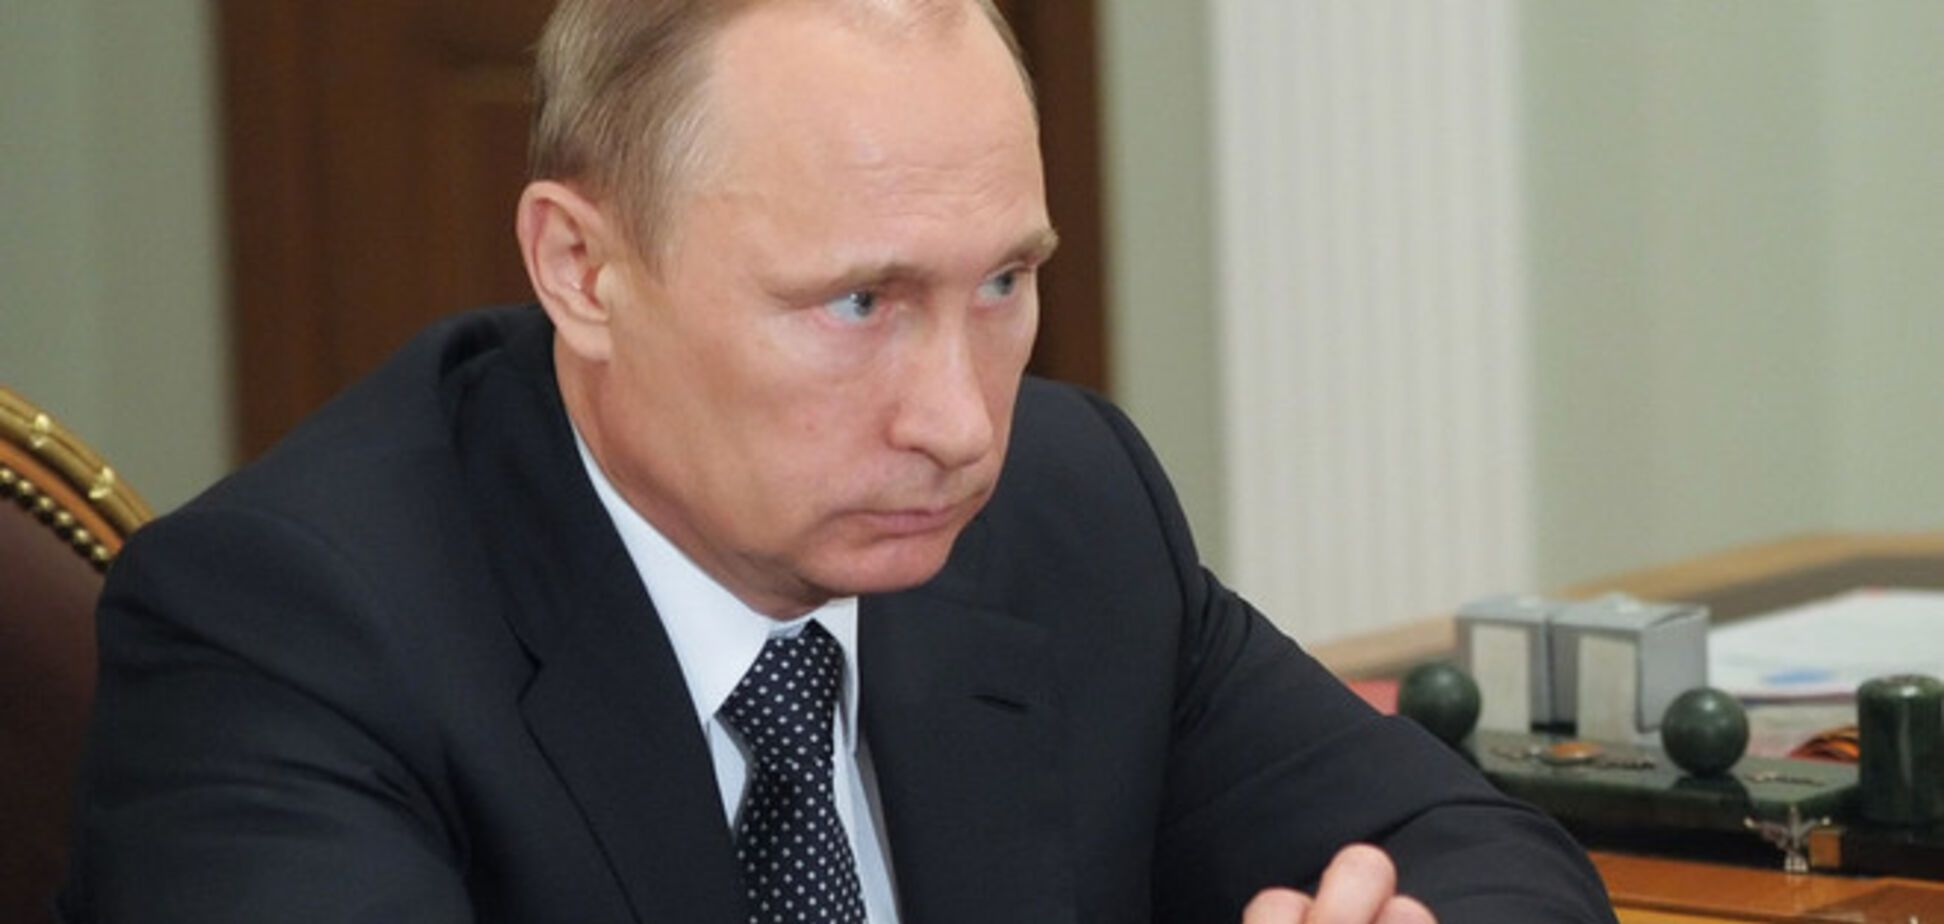 Путин одобрил резолюцию Совбеза ООН по авиакатастрофе Boeing-777